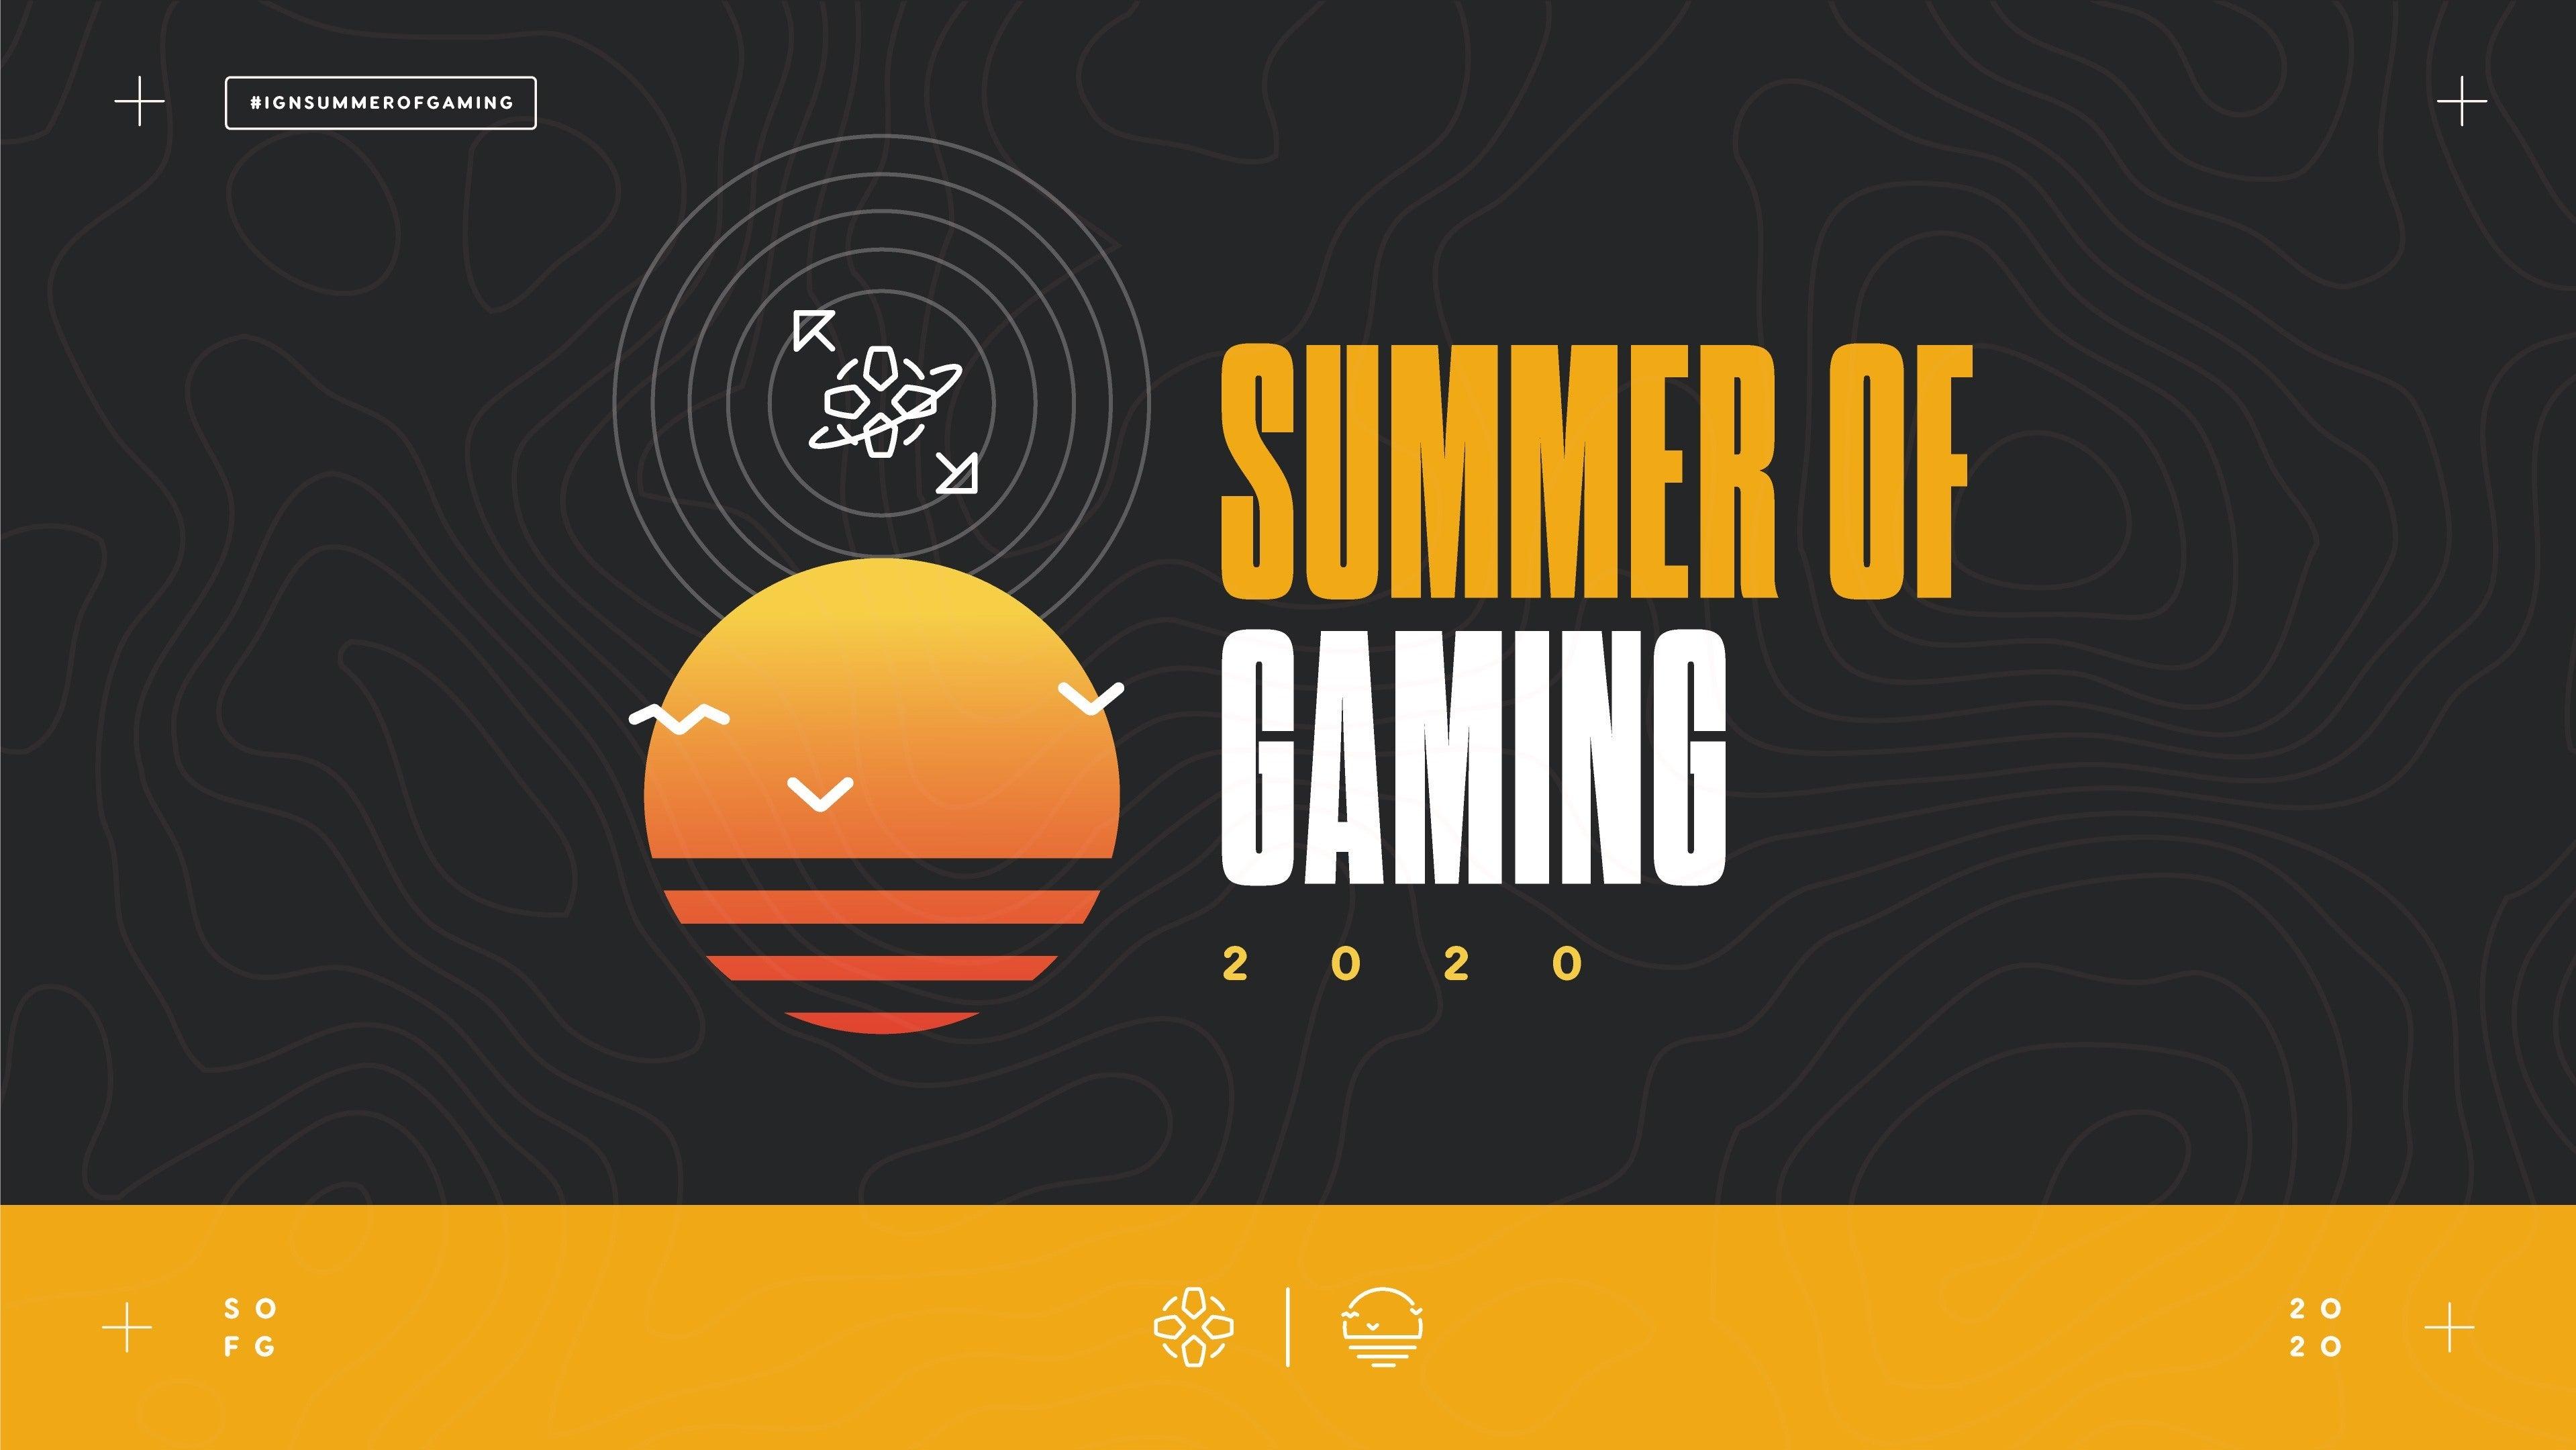 Запуск IGN Summer of Gaming 2020 перенесен на 8 июня